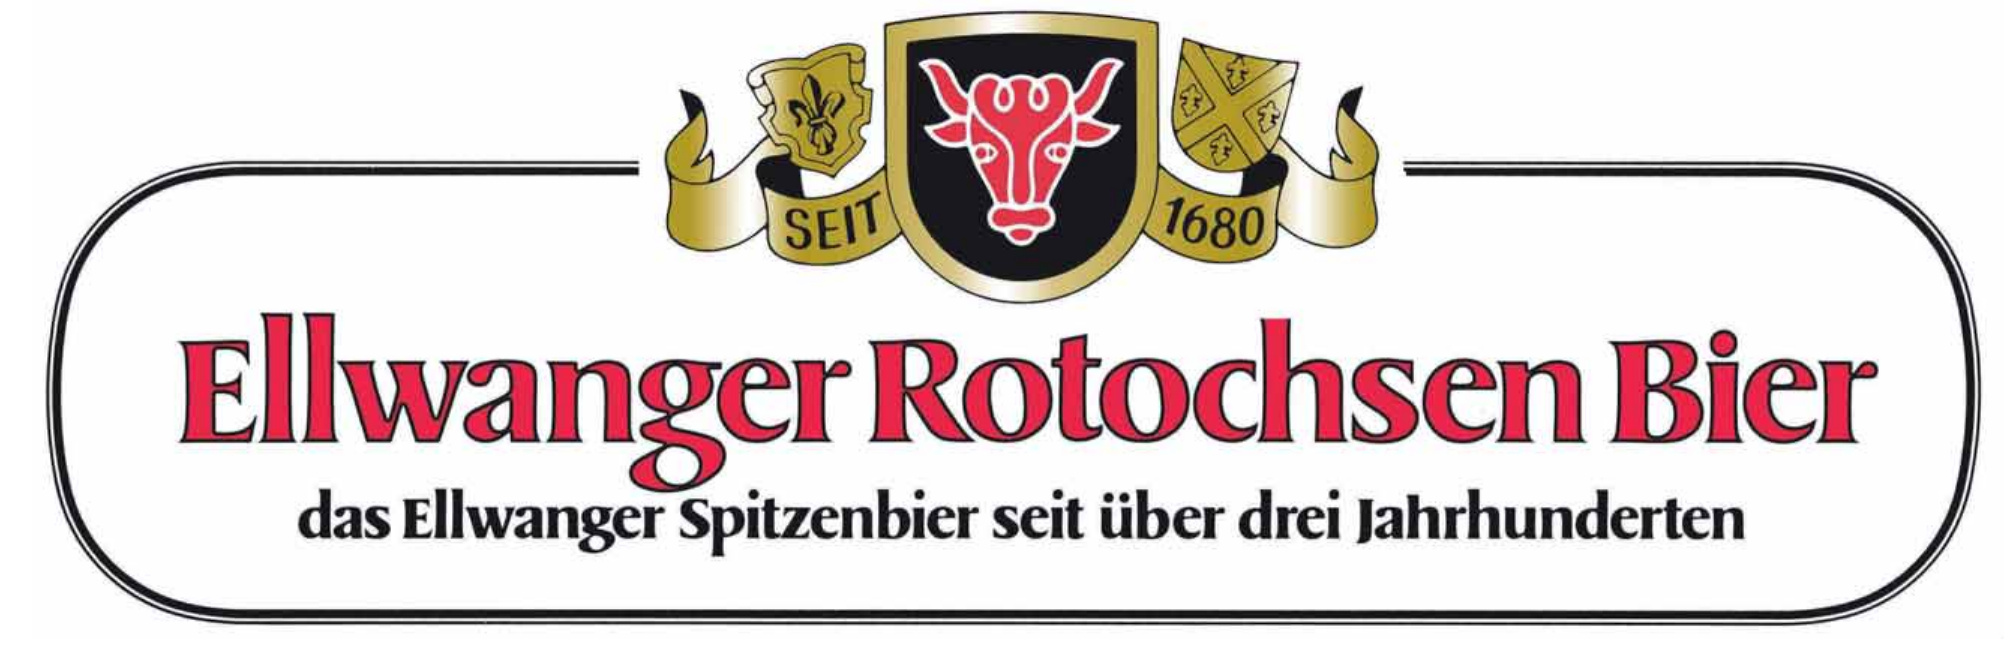 Ellwanger Rotochsen Bier